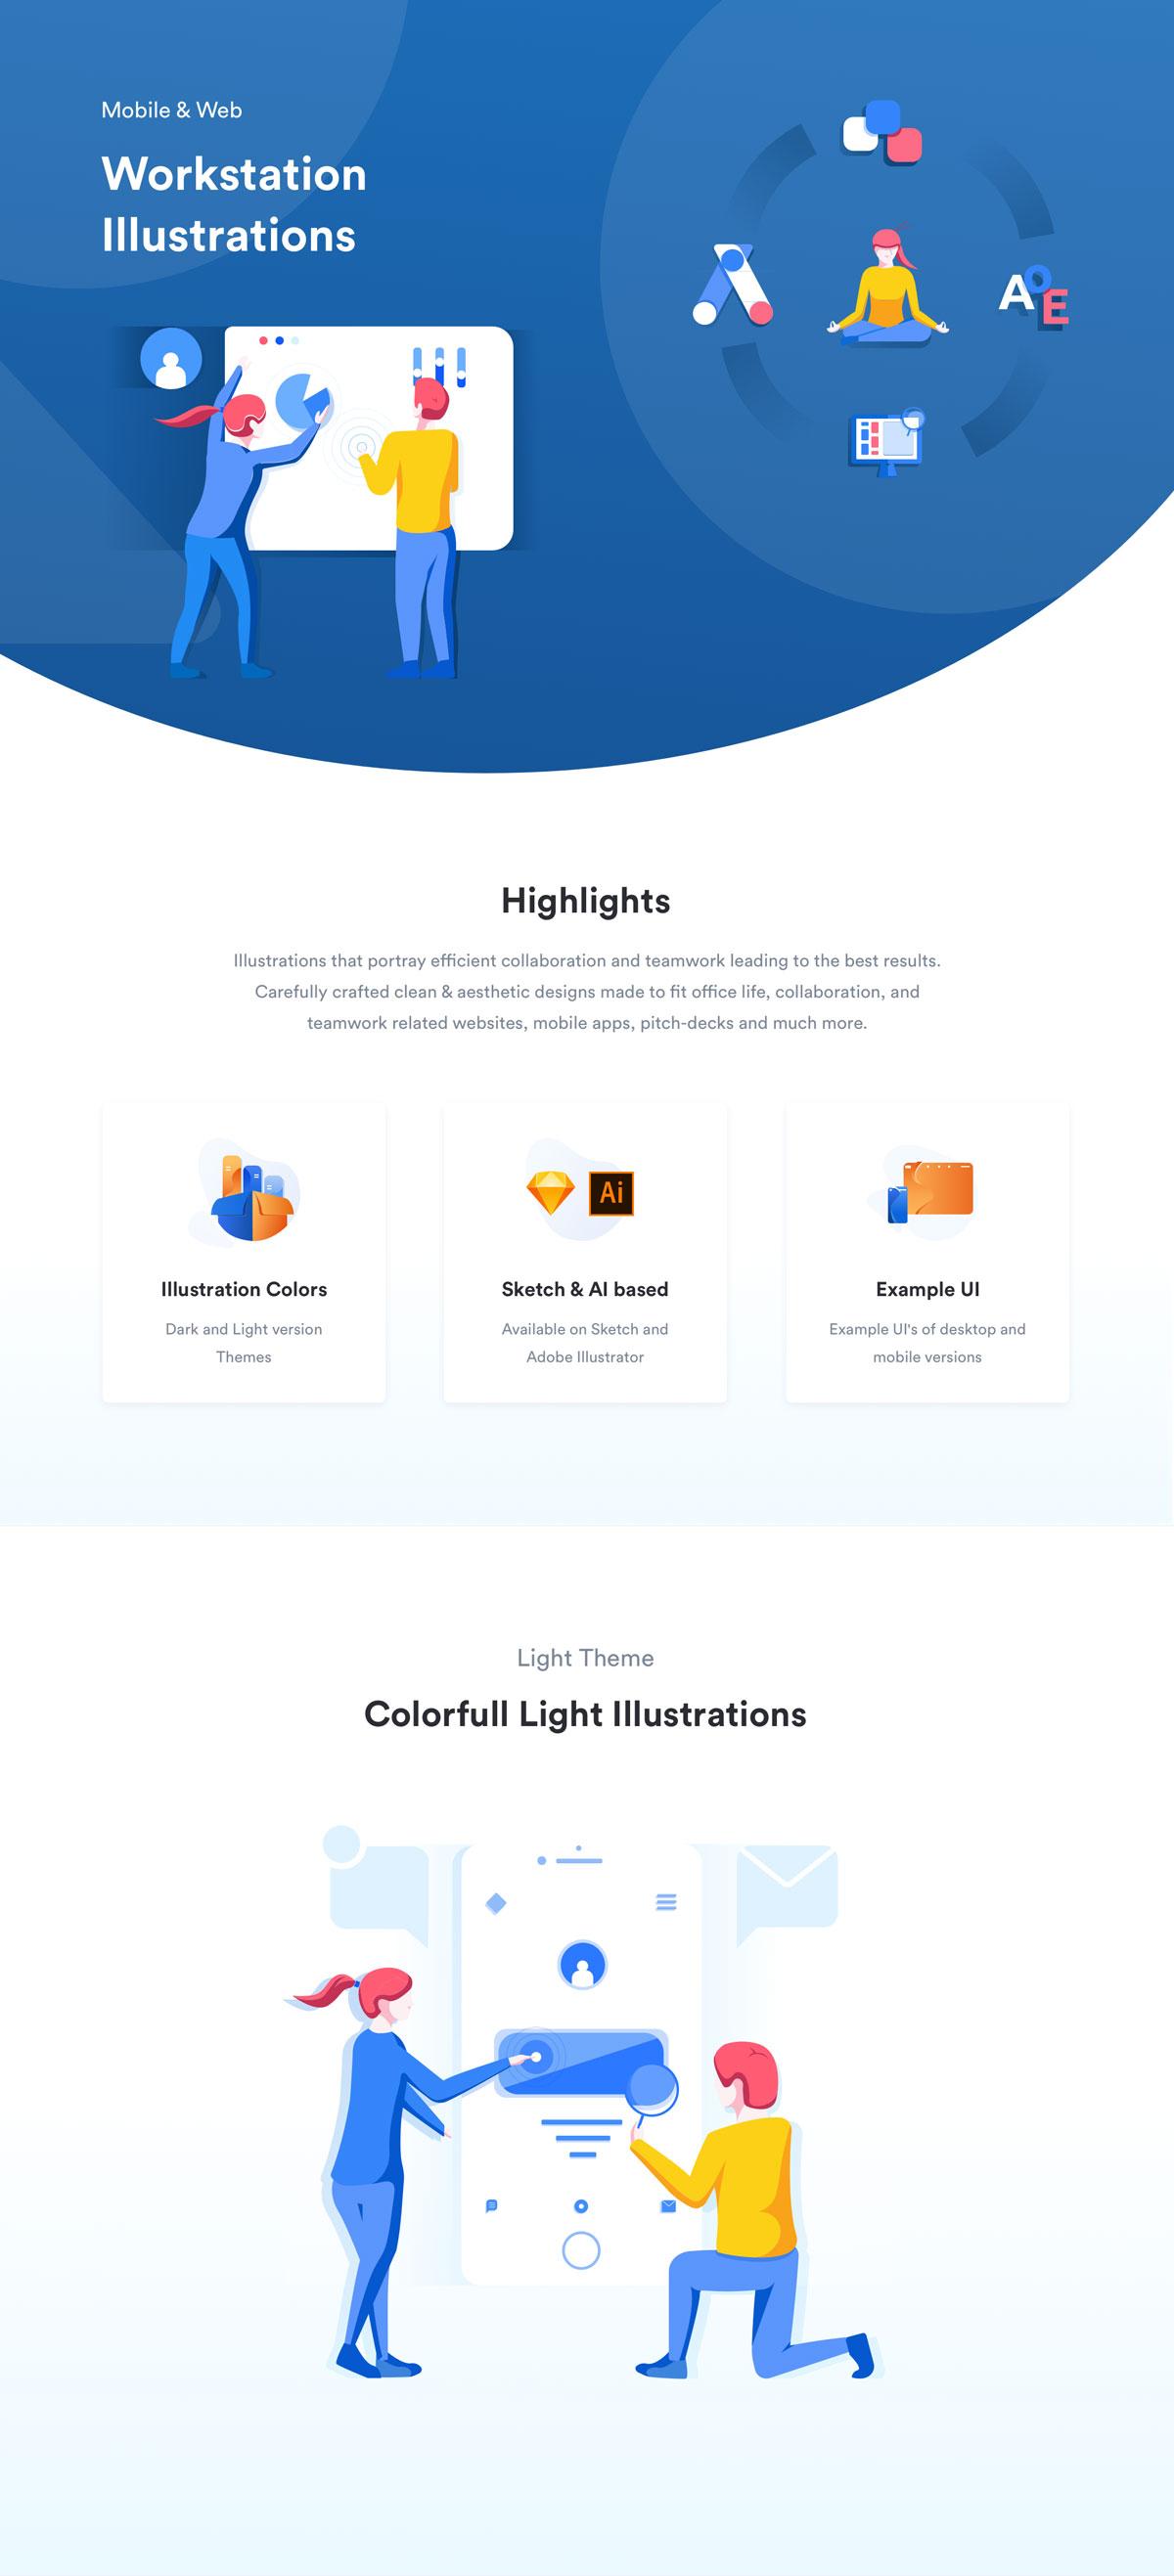 精心设计的团队合作和协作EPS矢量插图 Teamwork & Collaboration Illustrations插图(7)